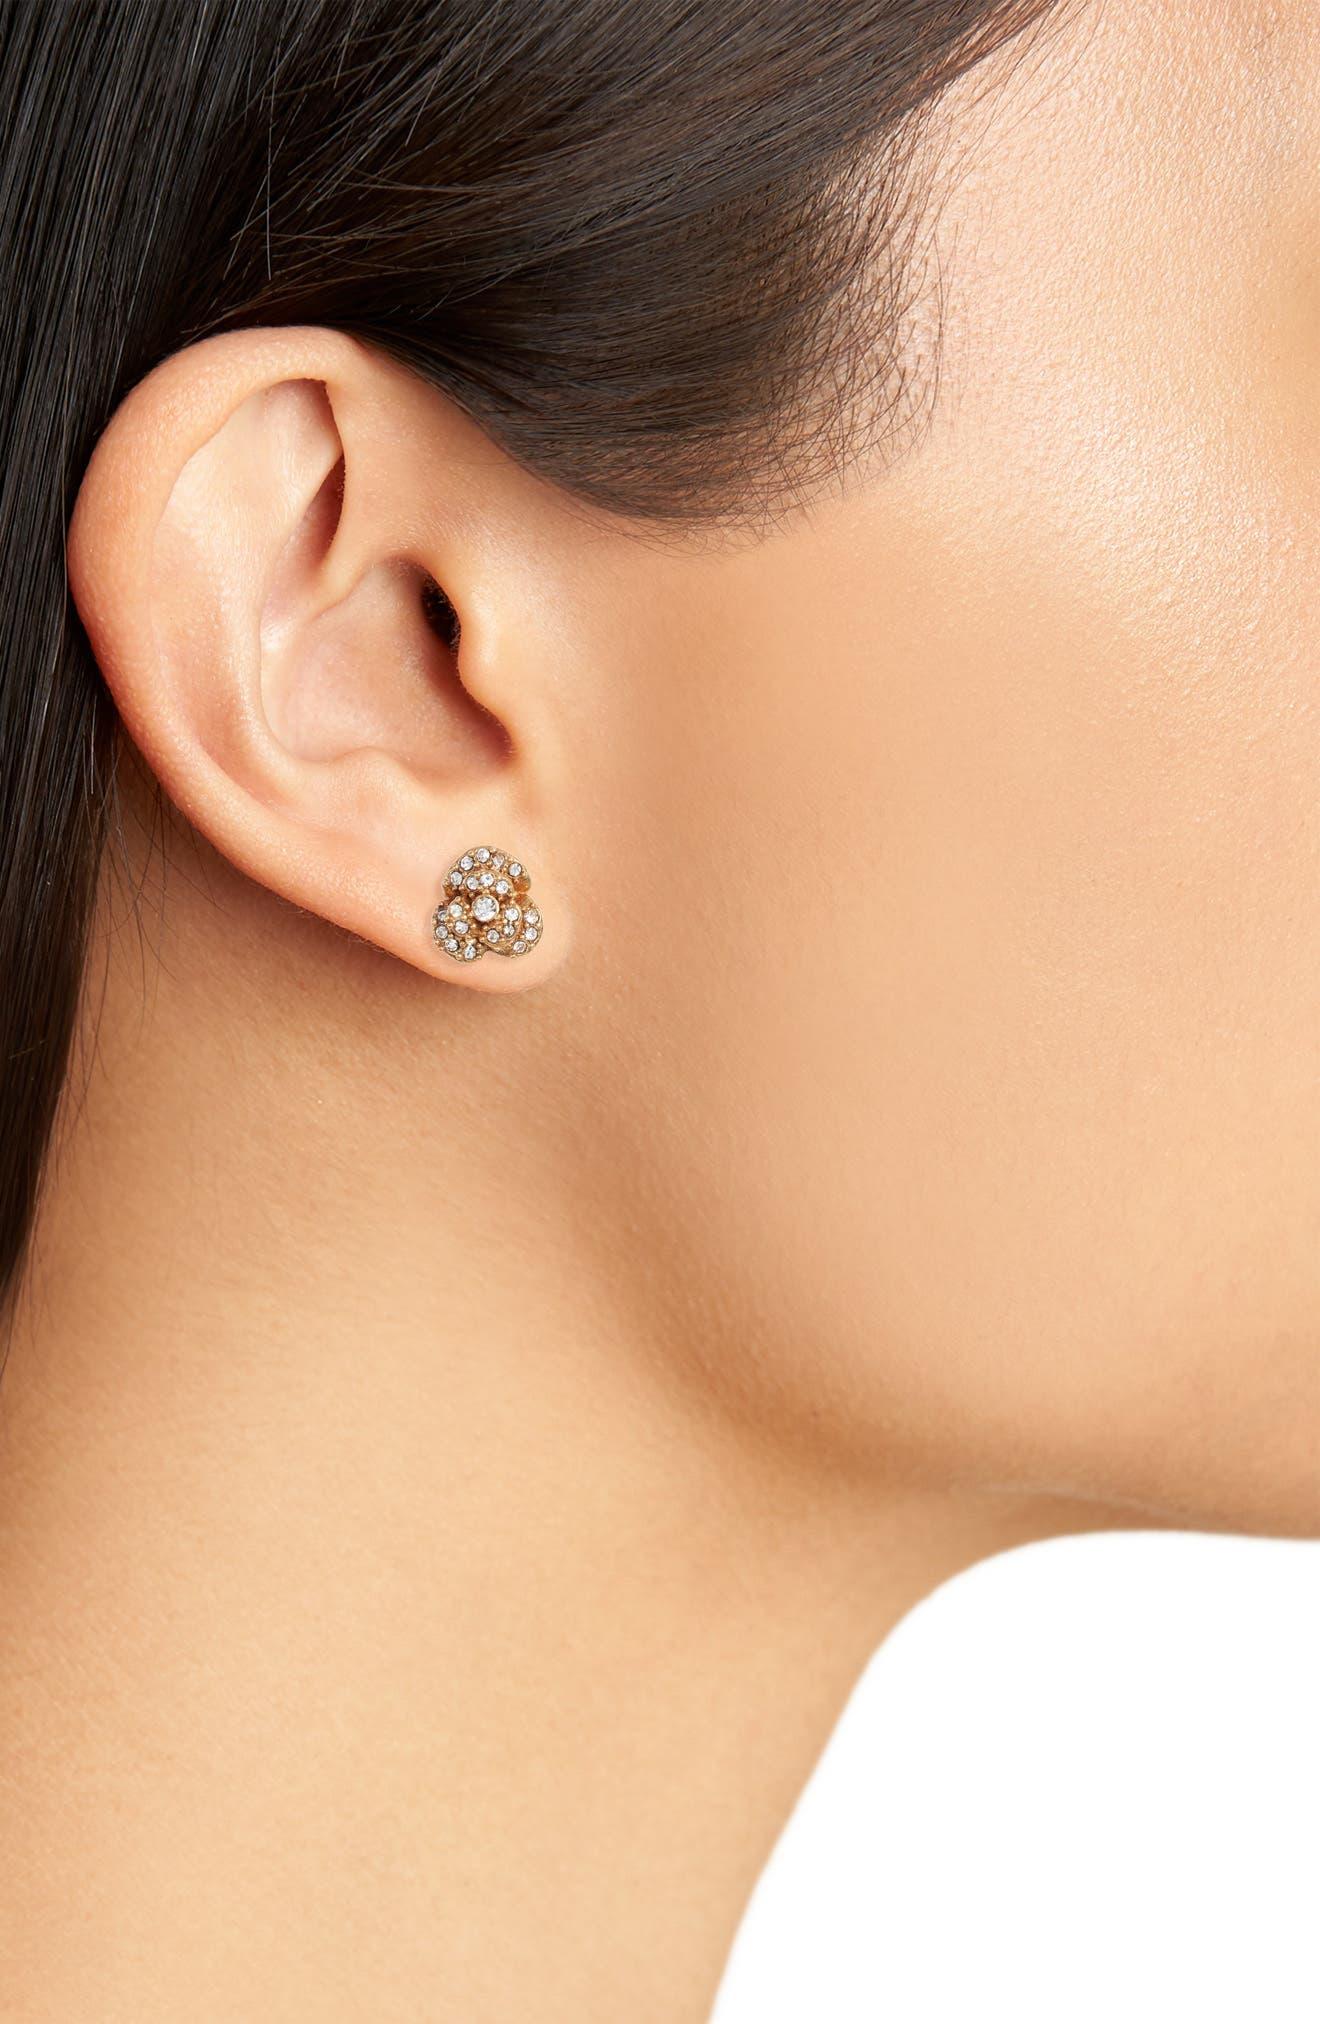 grandma's closet 3-pack stud earrings,                             Alternate thumbnail 2, color,                             710